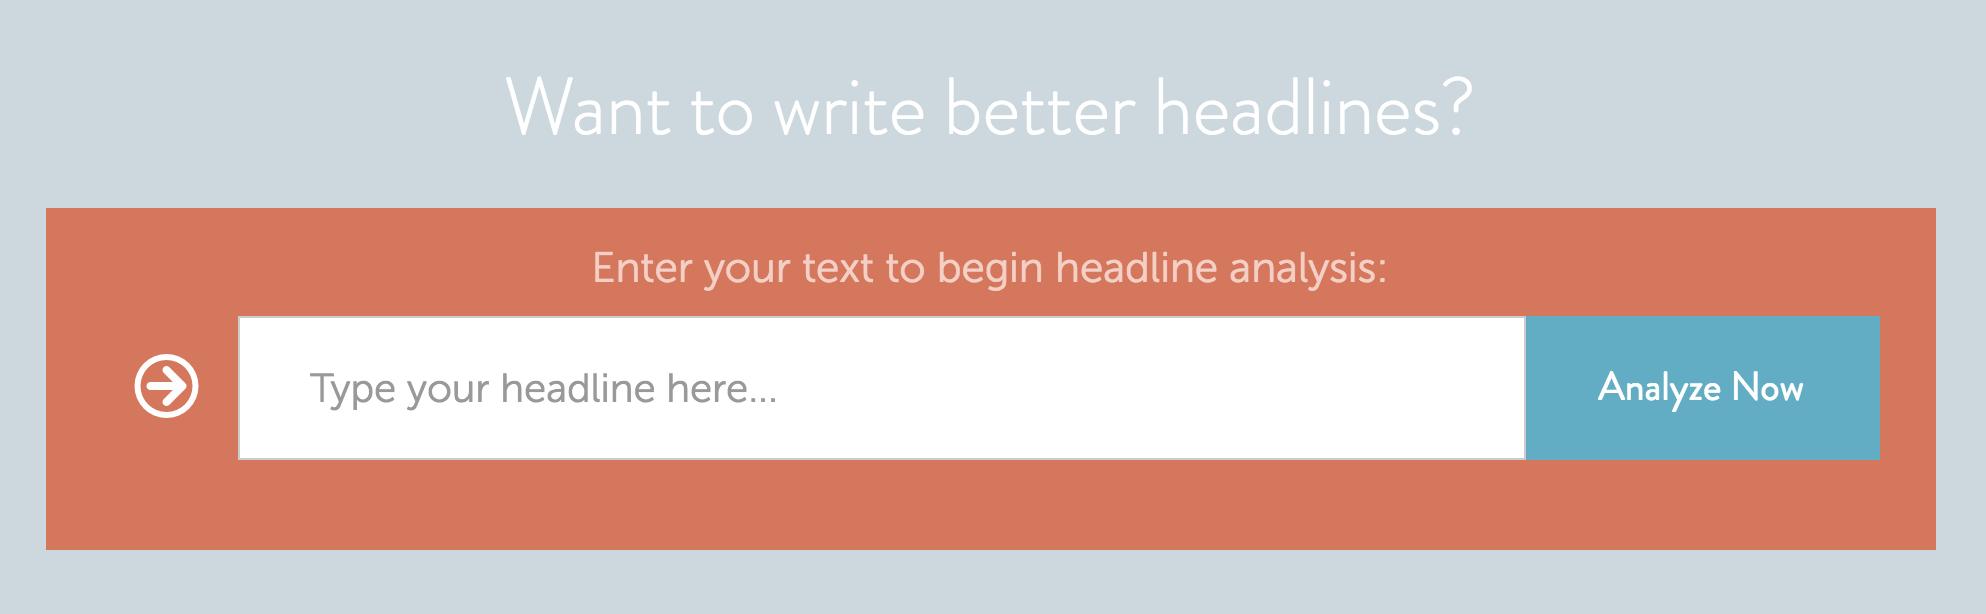 Blogging Tips and Tricks for Beginners   blog post headline analyzer tool